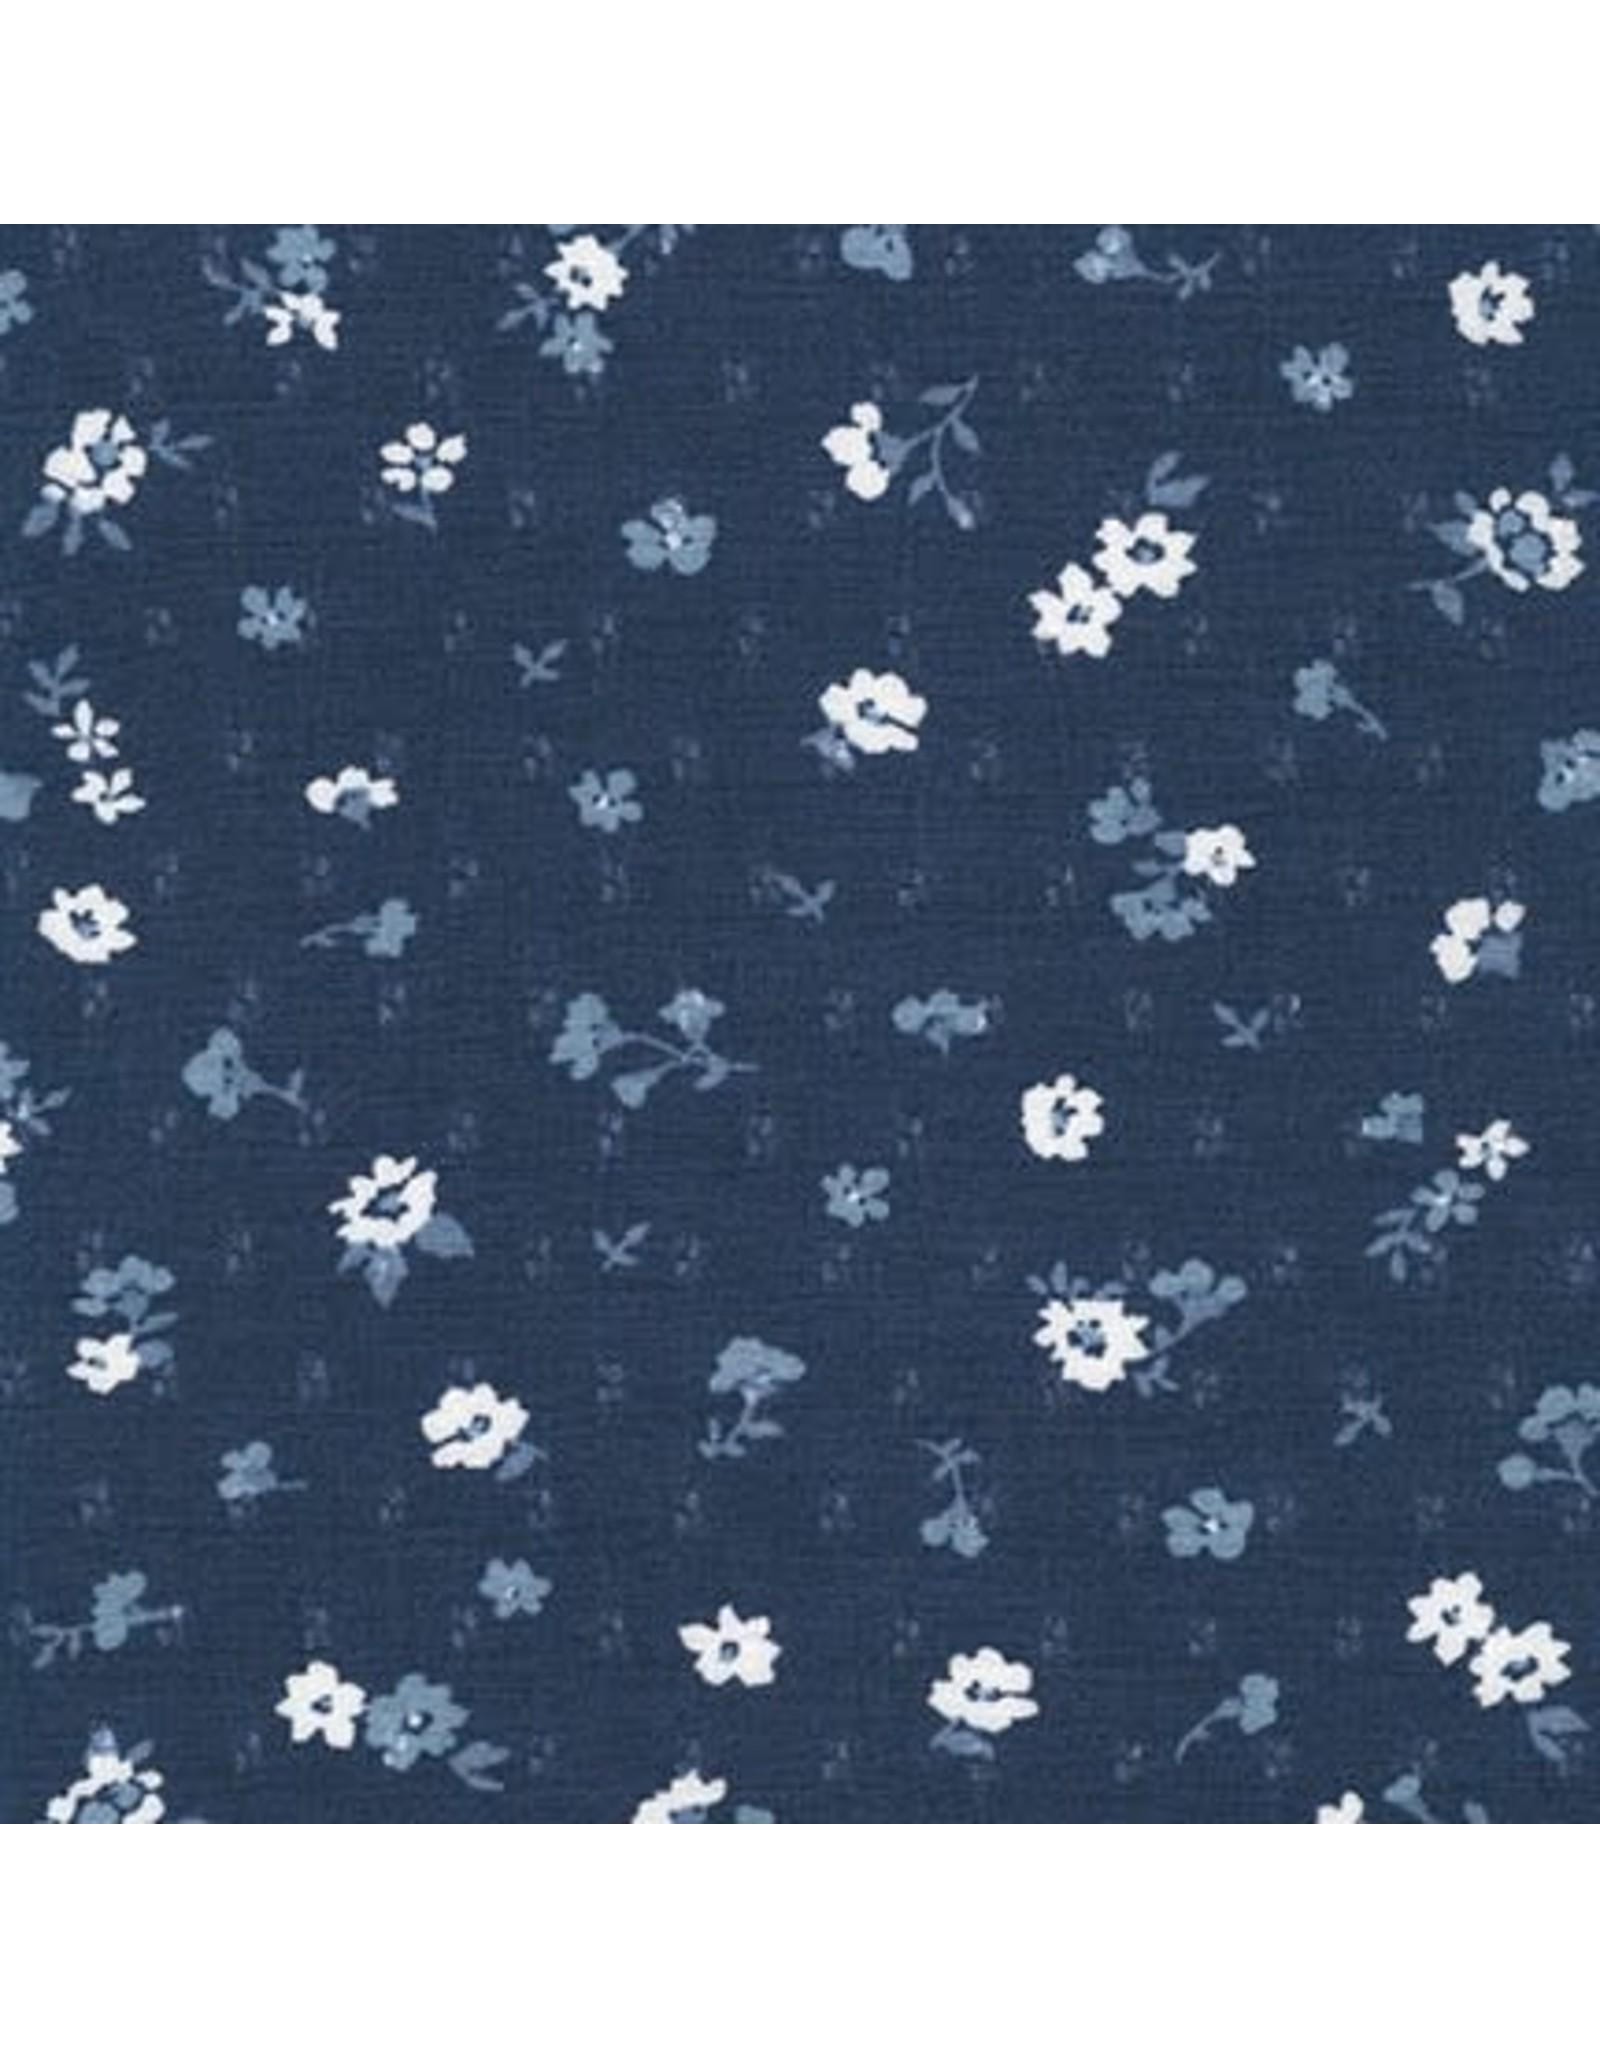 Robert Kaufman Rayon, Sunset Studio Collection, Yoryu Jacquard in Denim Blue, Fabric Half-Yards